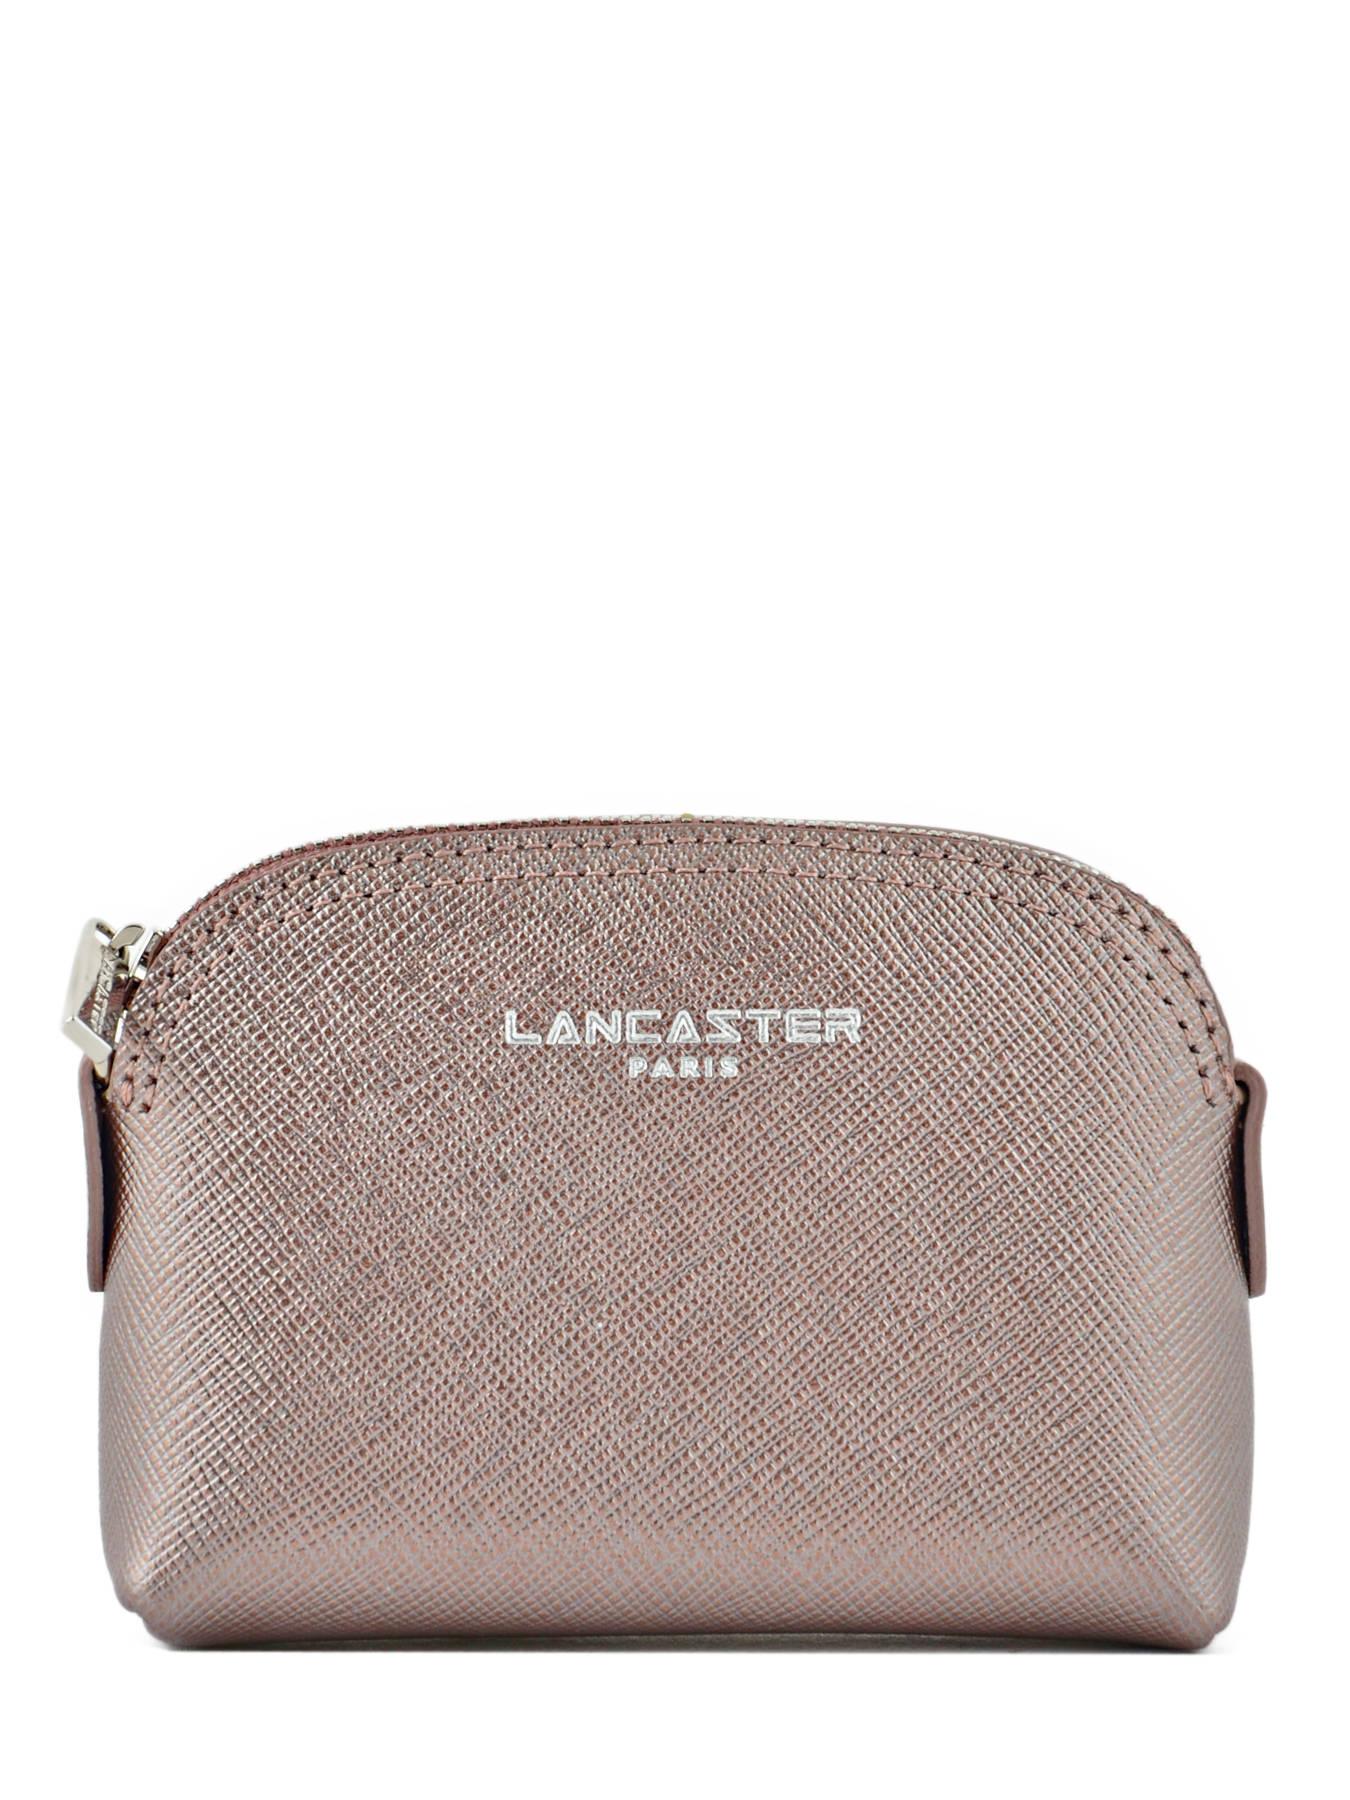 Porte monnaie lancaster adele or rose en vente au meilleur prix - Porte monnaie femme lancaster ...